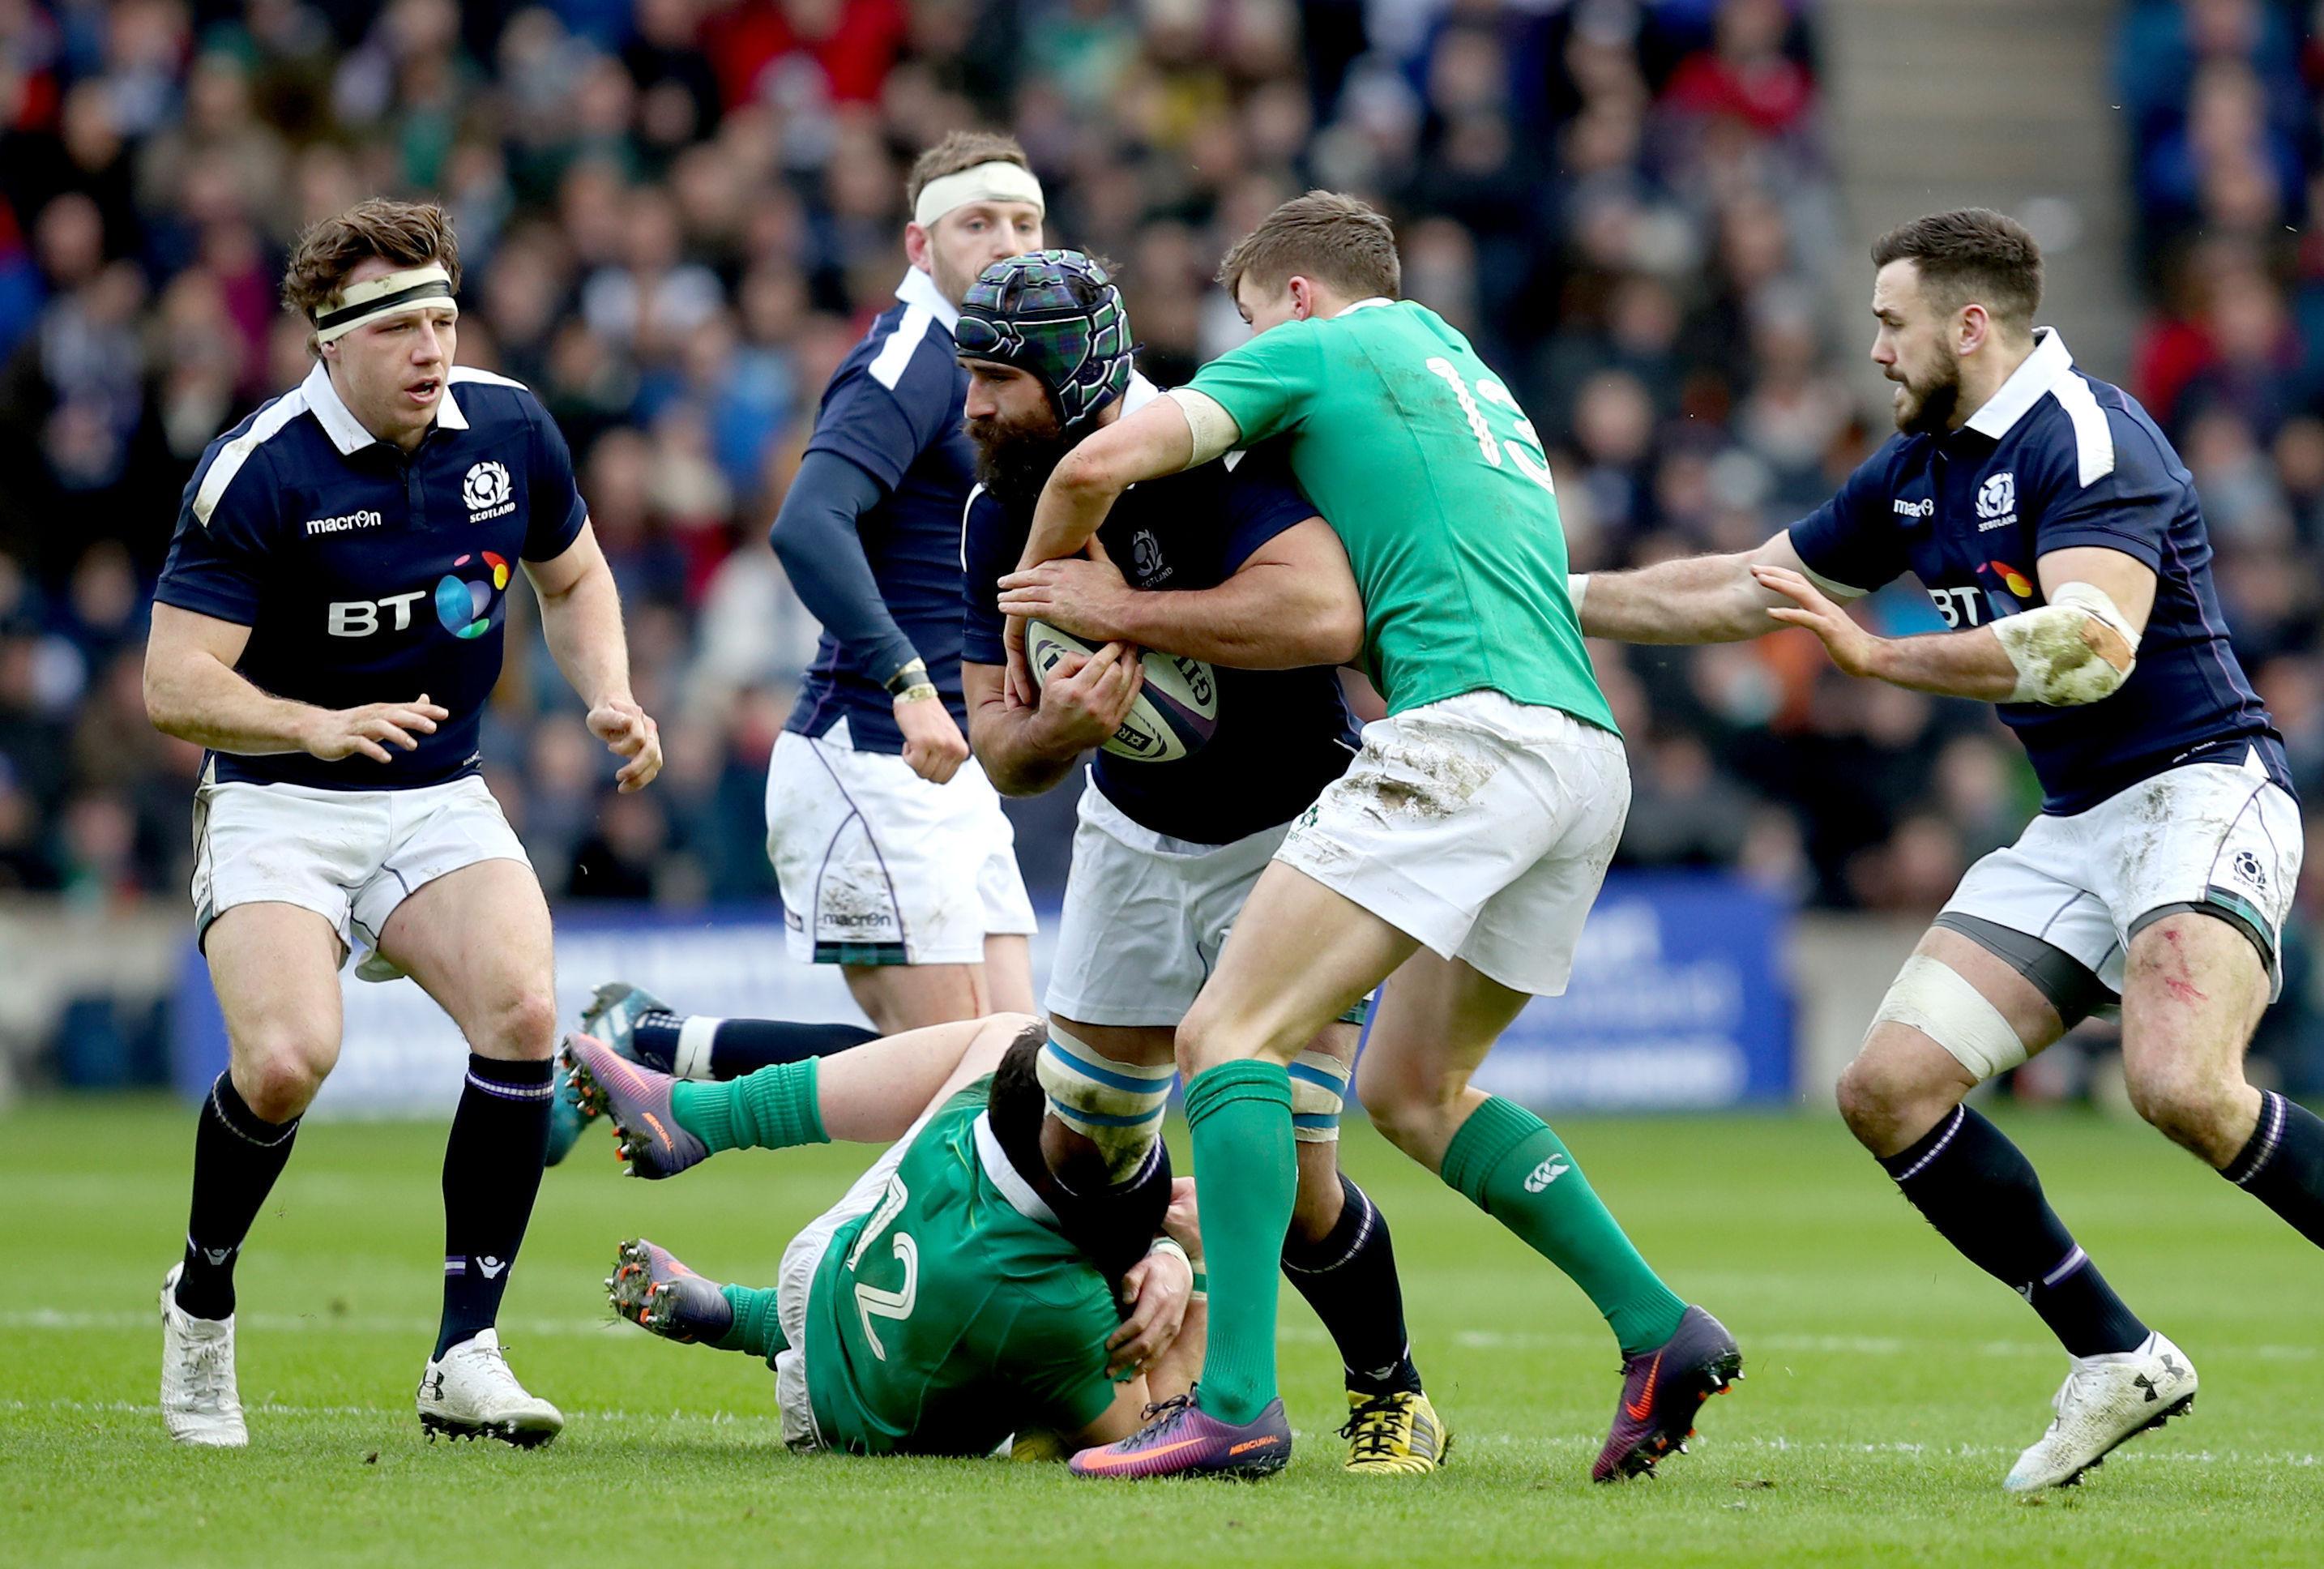 Scotland's Josh Strauss is tackled by Ireland's Garry Ringrose at Murrayfield.